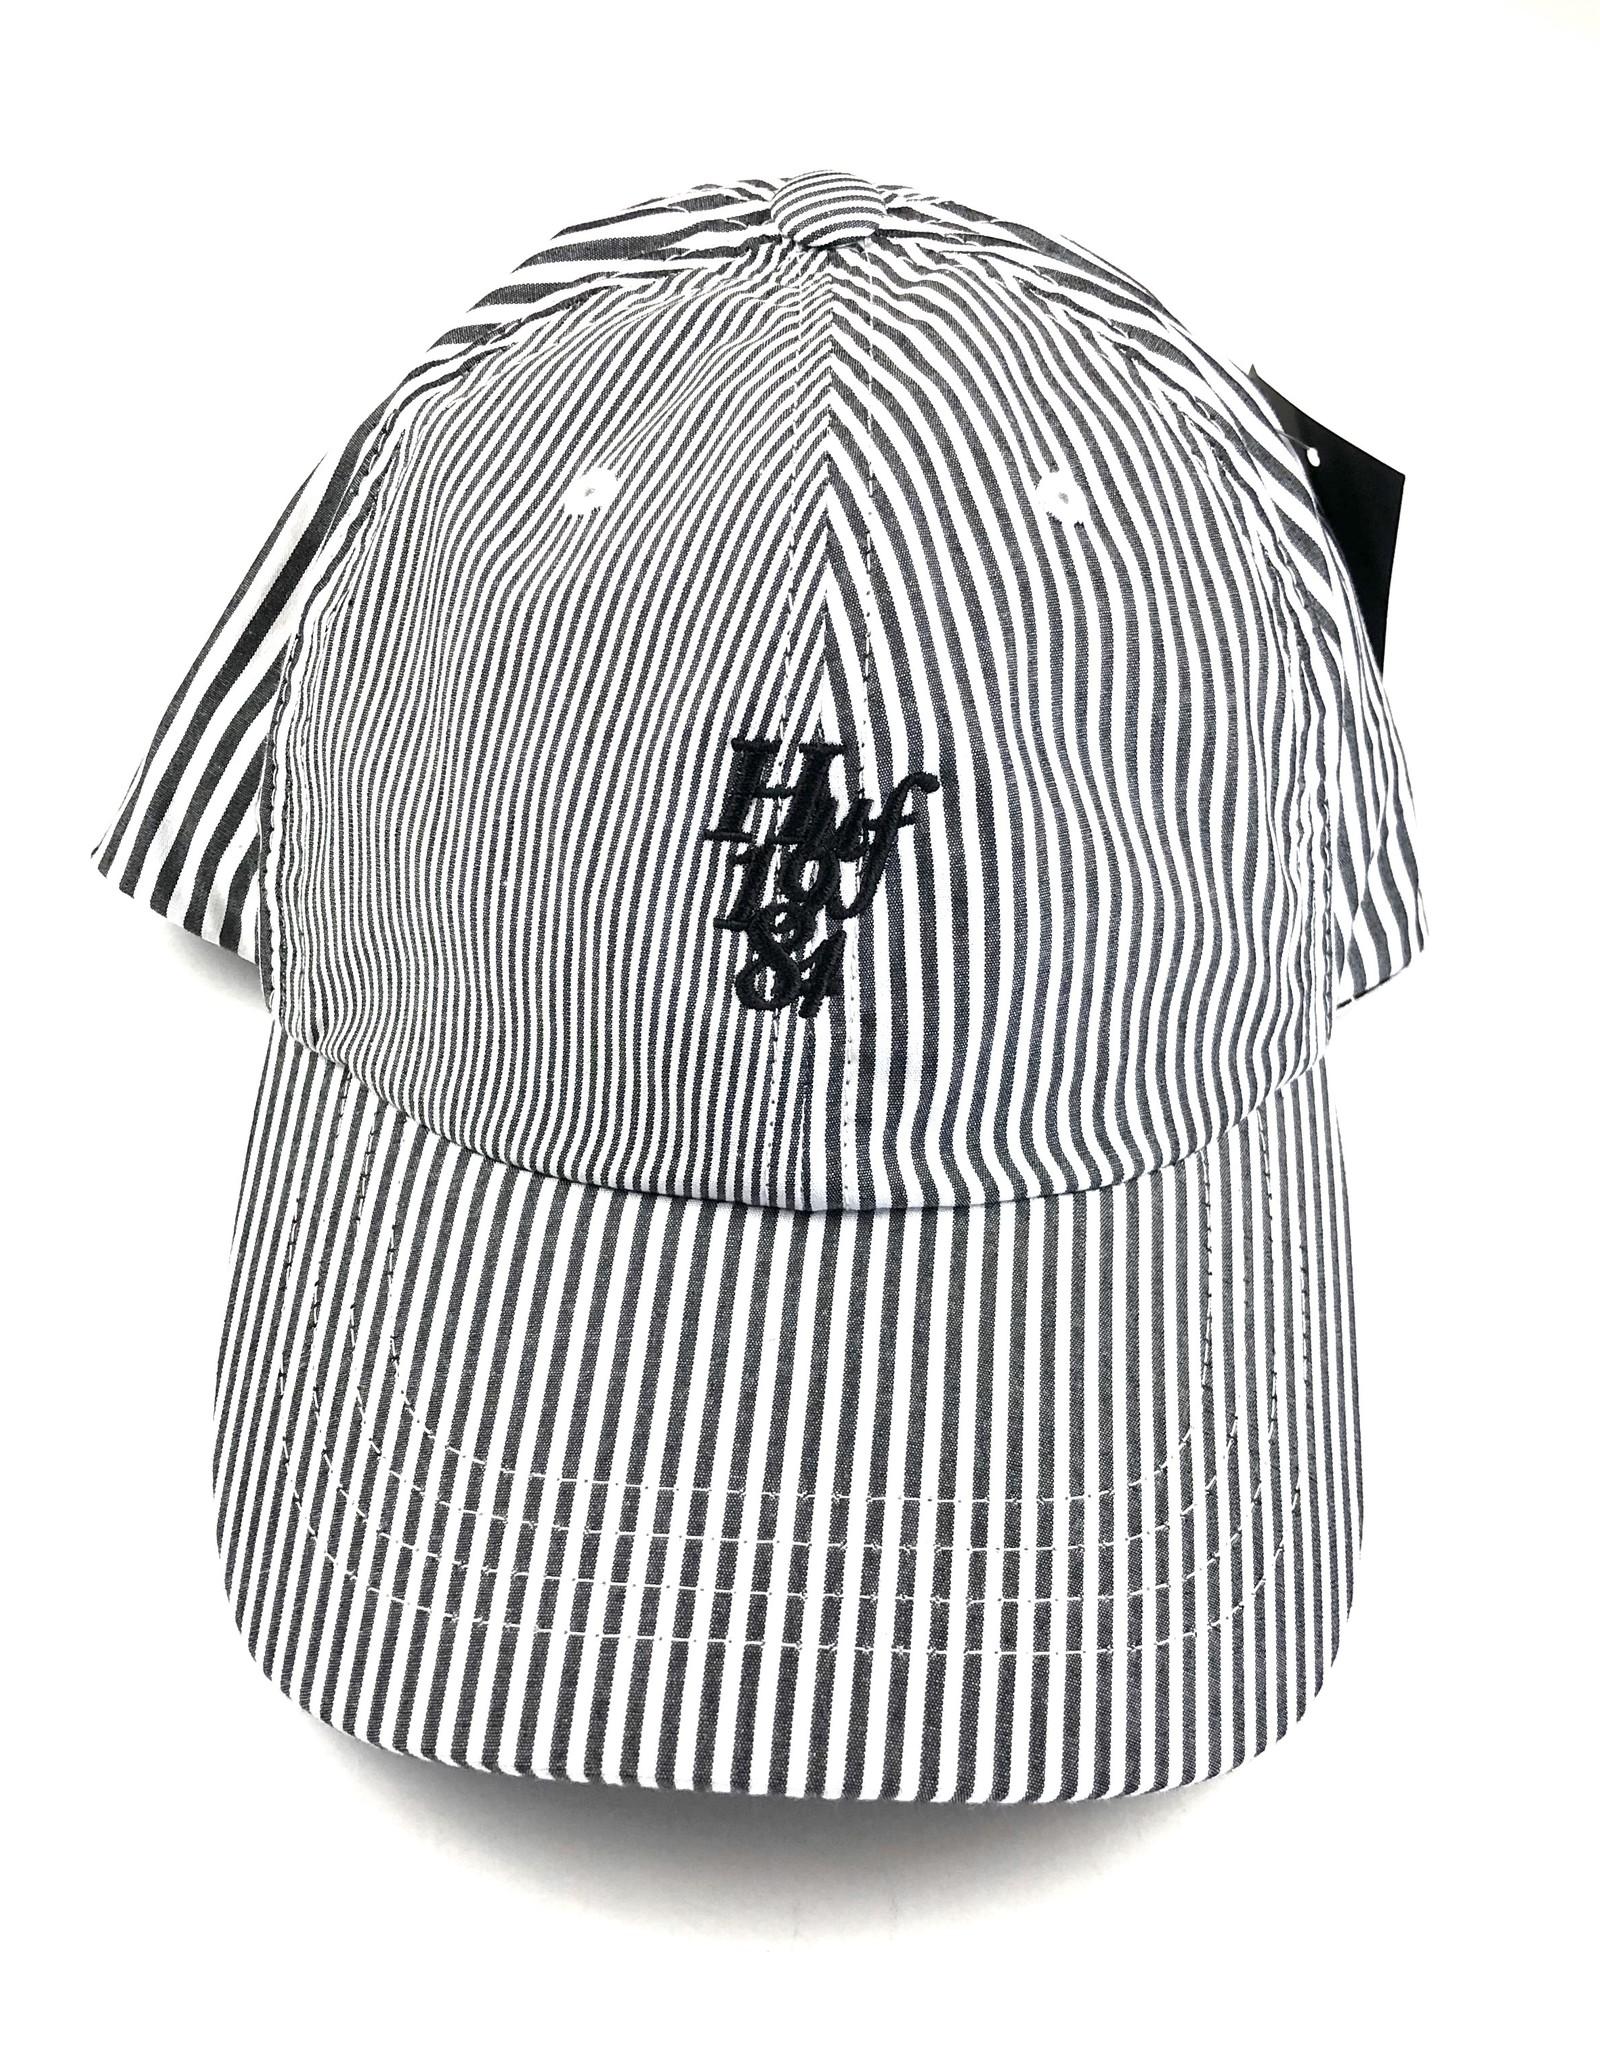 HUF DISORDER CV 6 PANEL HAT - WHITE